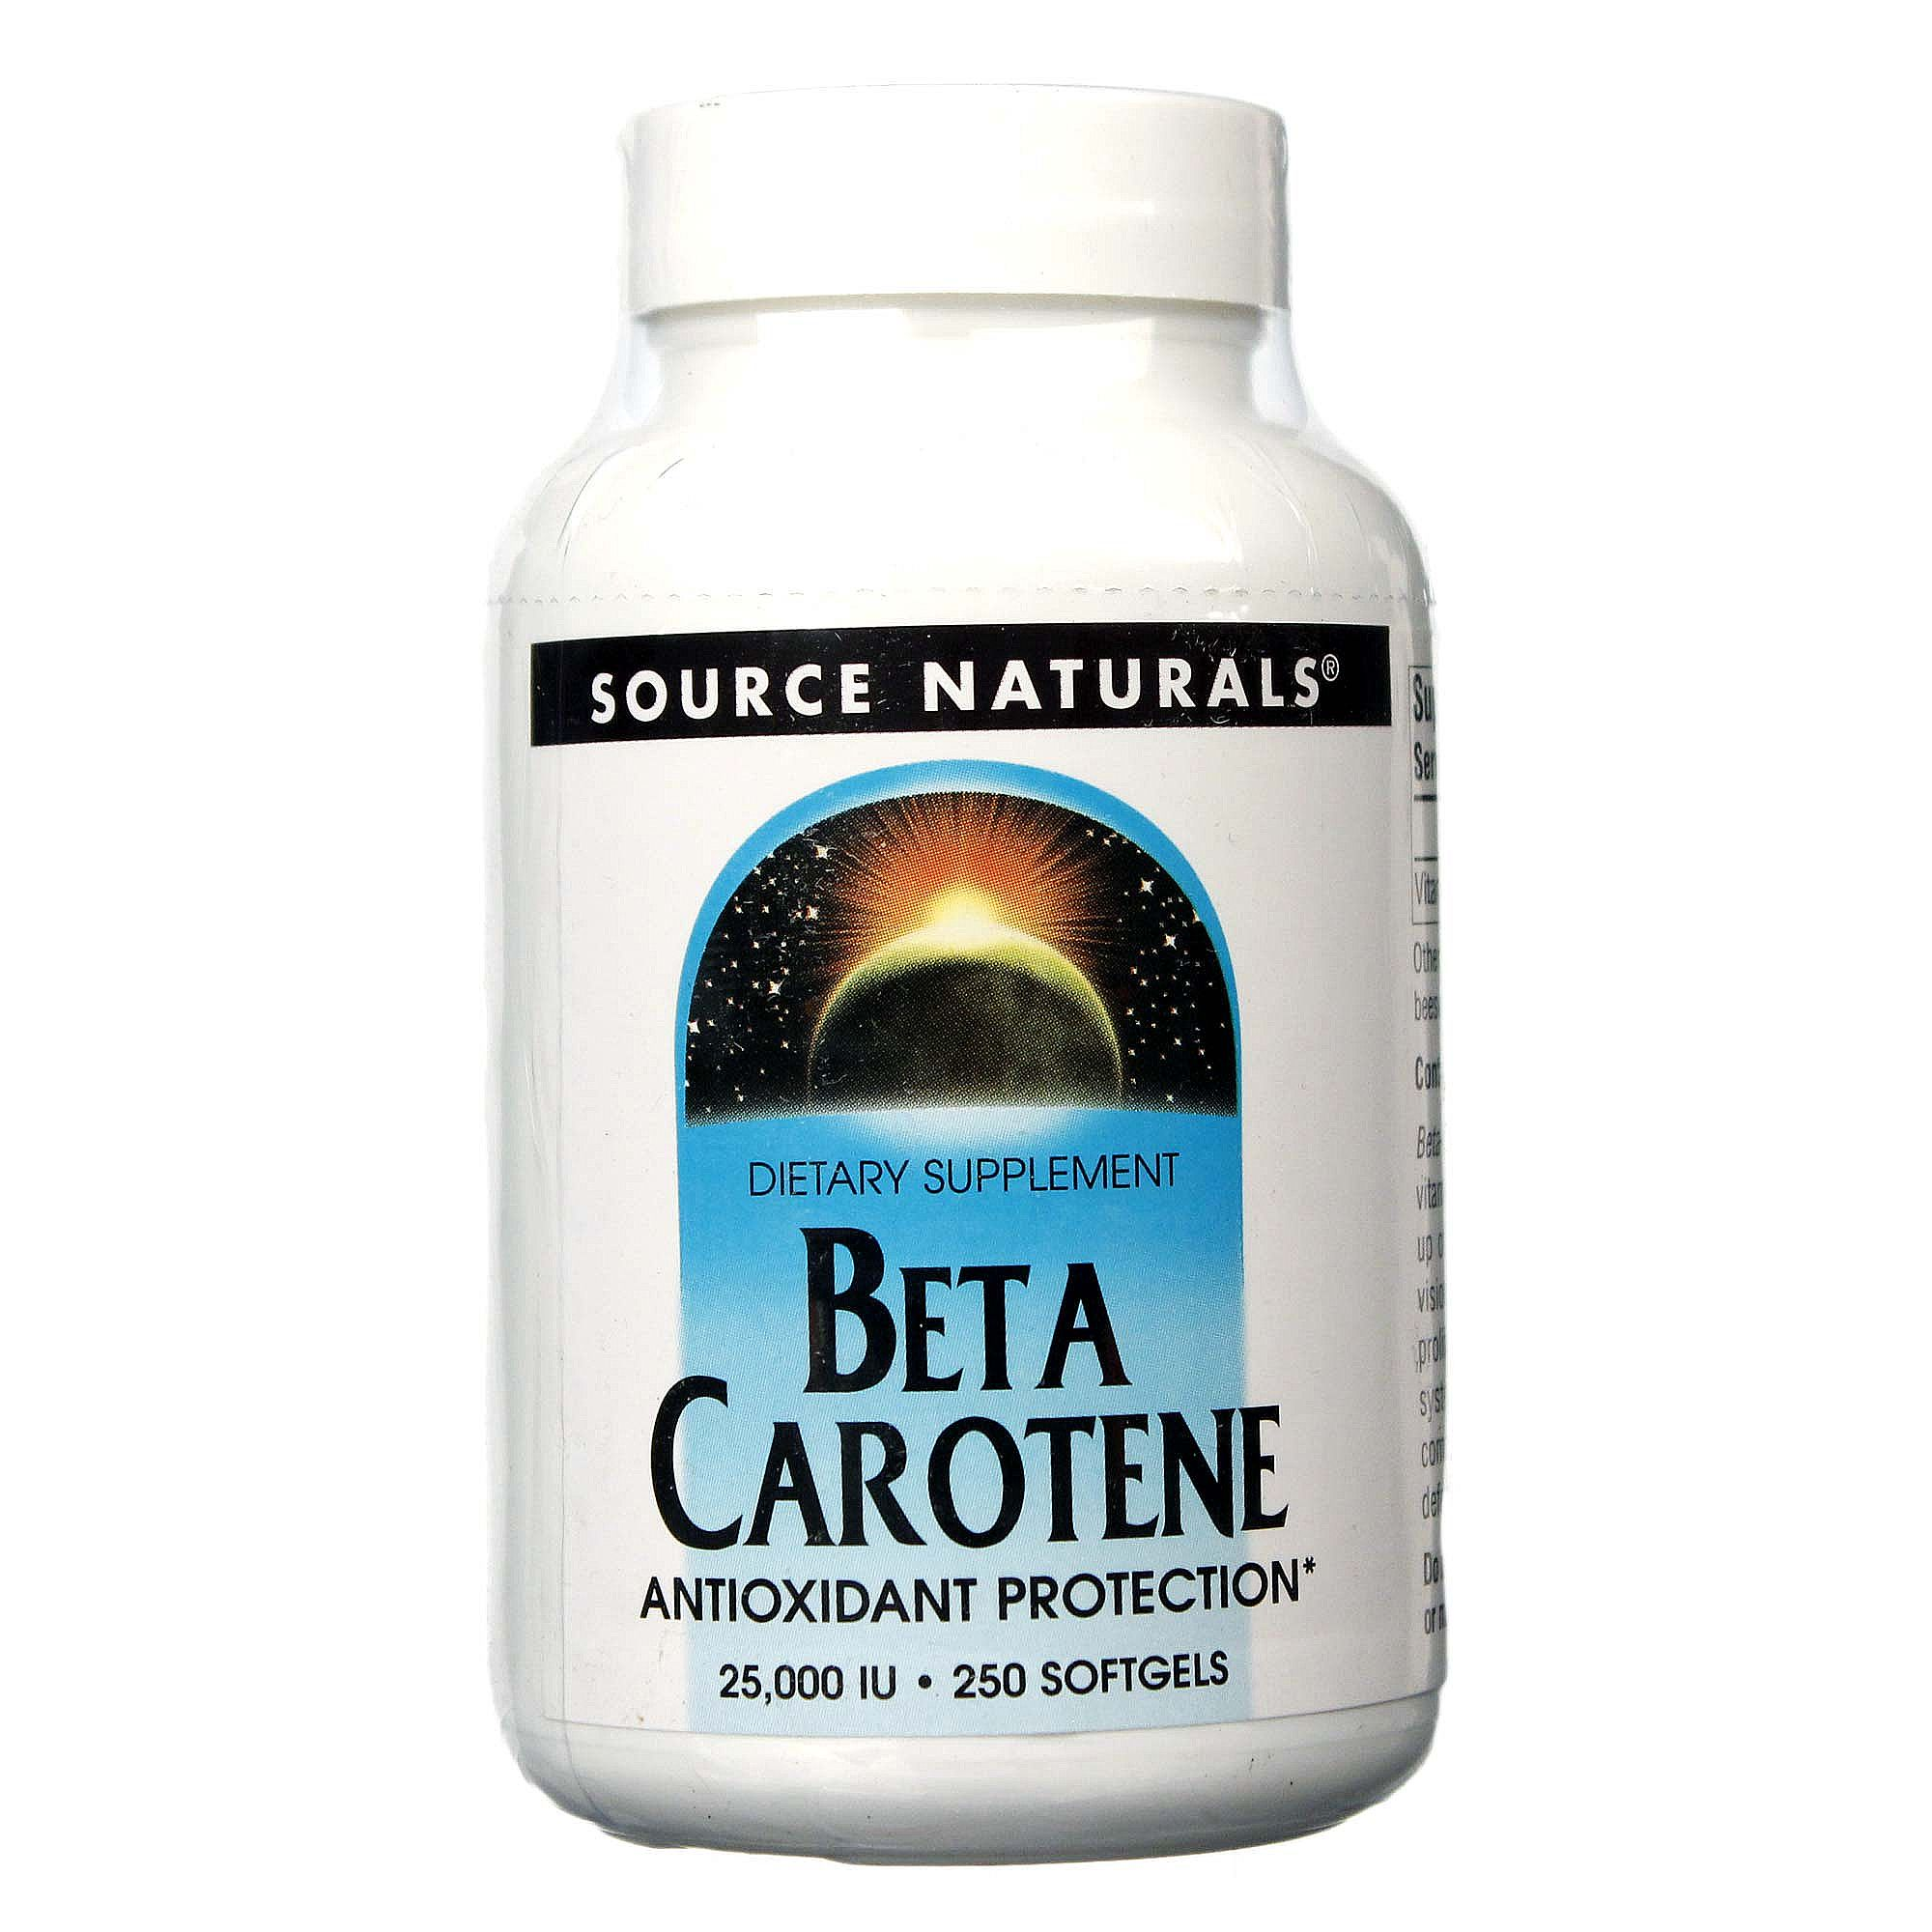 Beta carotene source